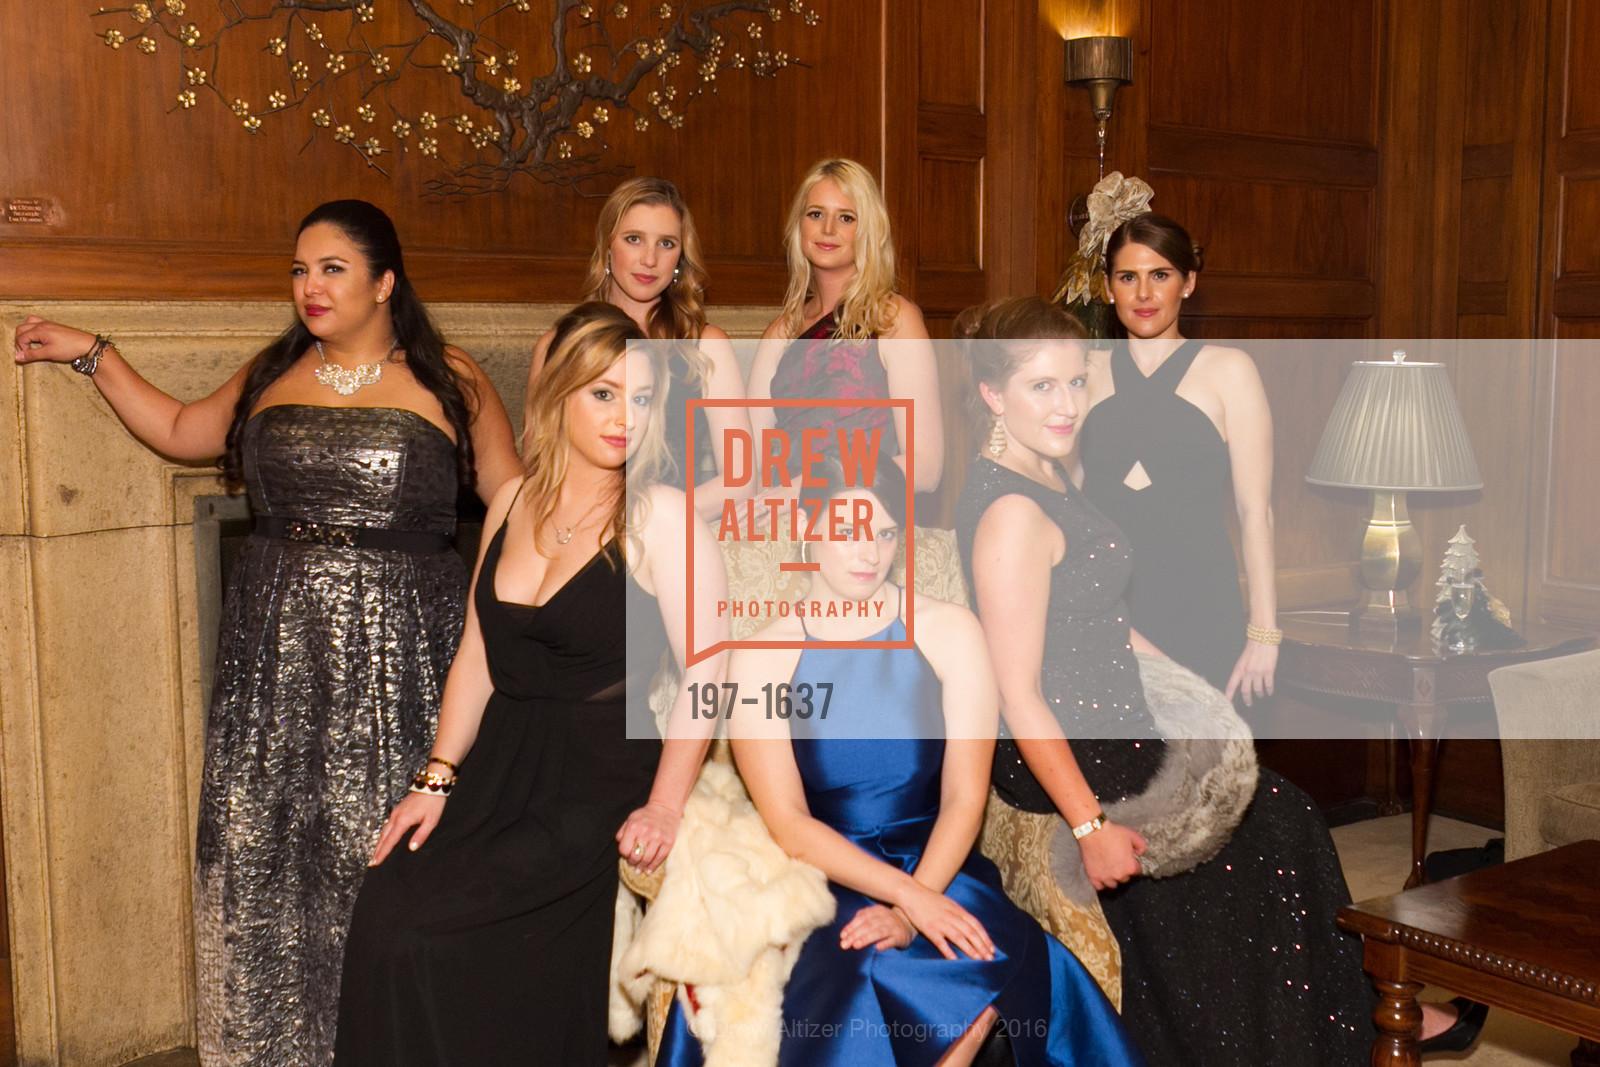 Deyanira Medina, Courtney Costello, Jenn Hazelwood, Laura Moir, Bailey Douglass, Eve Denton, Cailin Todd, Photo #197-1637